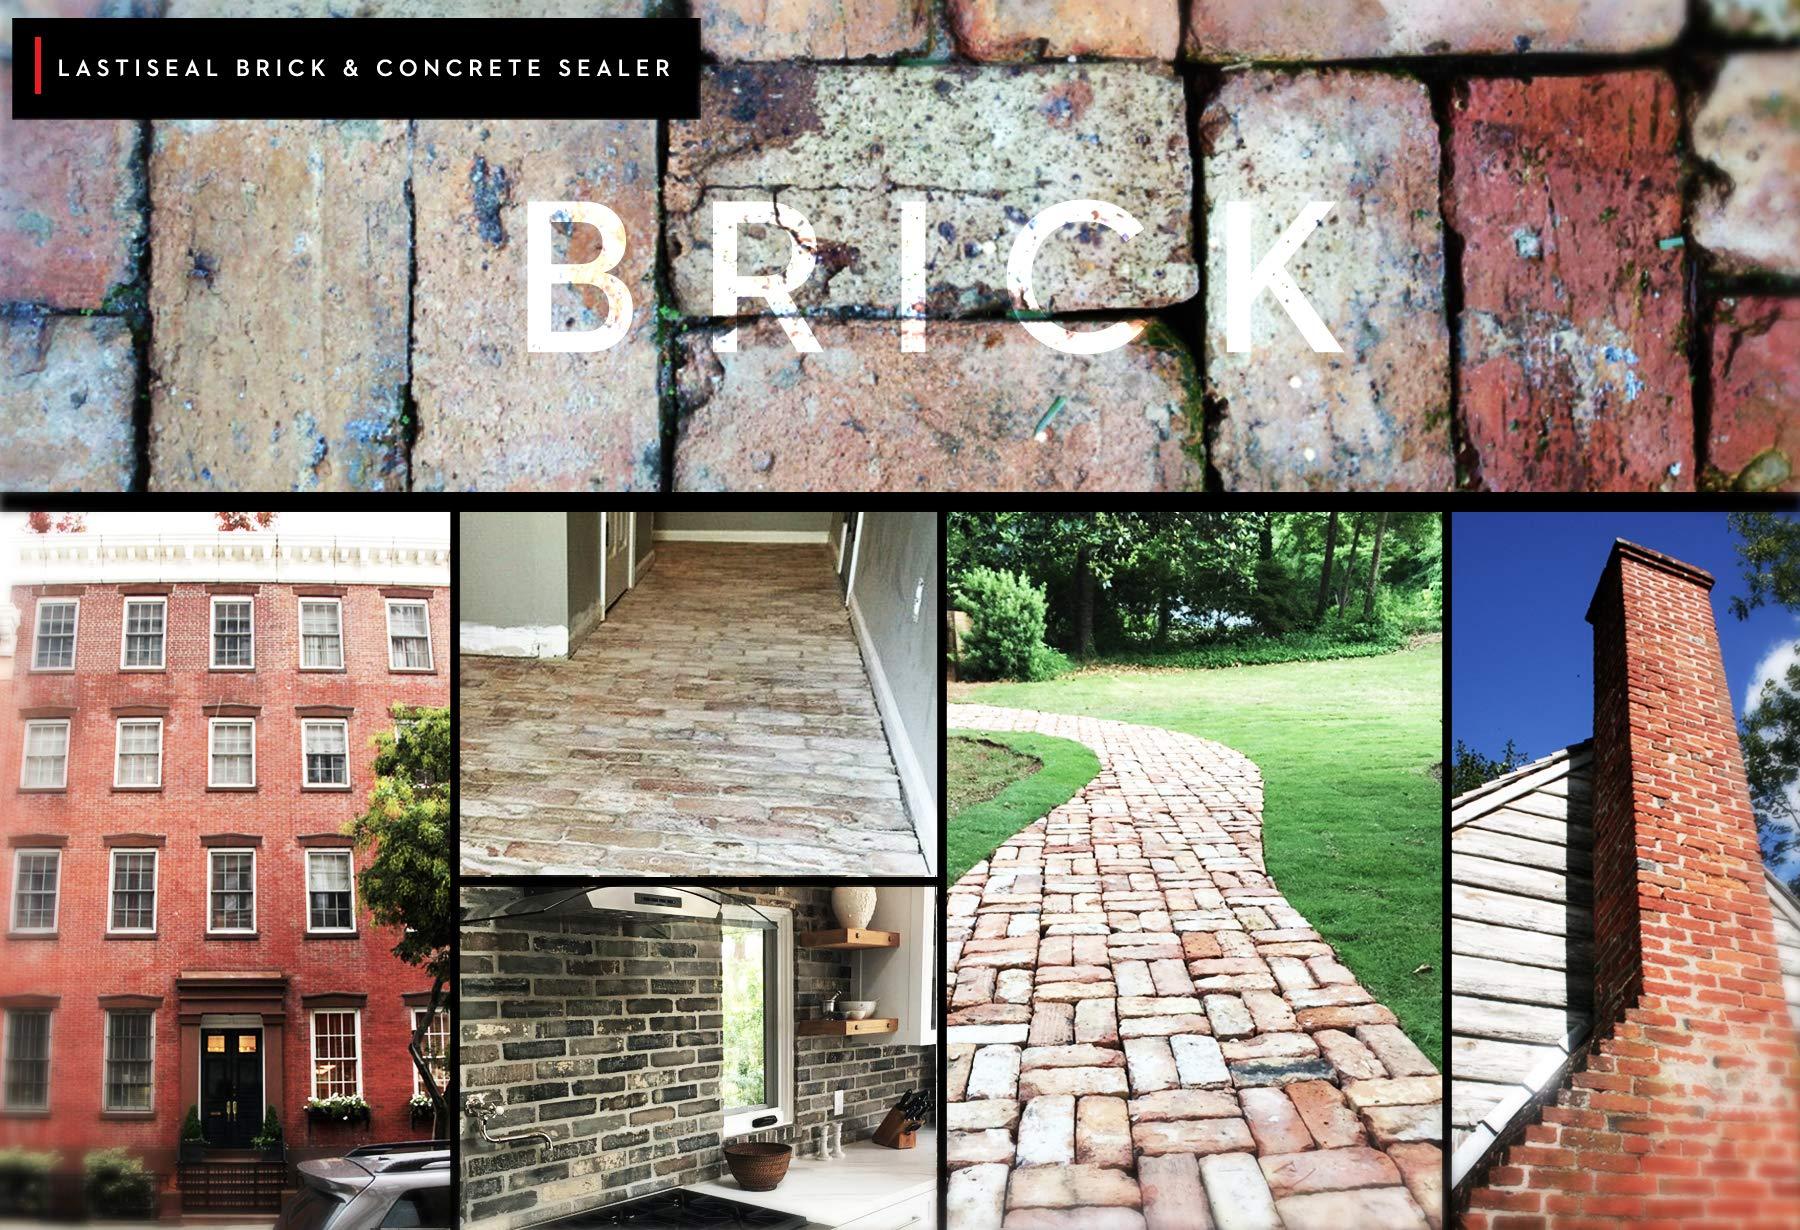 LastiSeal Brick & Concrete Sealer - SATIN Finish (5-gal) | All Purpose Sealer for Brick, Concrete, Stone, Porous Masonry | 15-Year Waterproofing Warranty | Low Gloss Sheen by RadonSeal (Image #2)